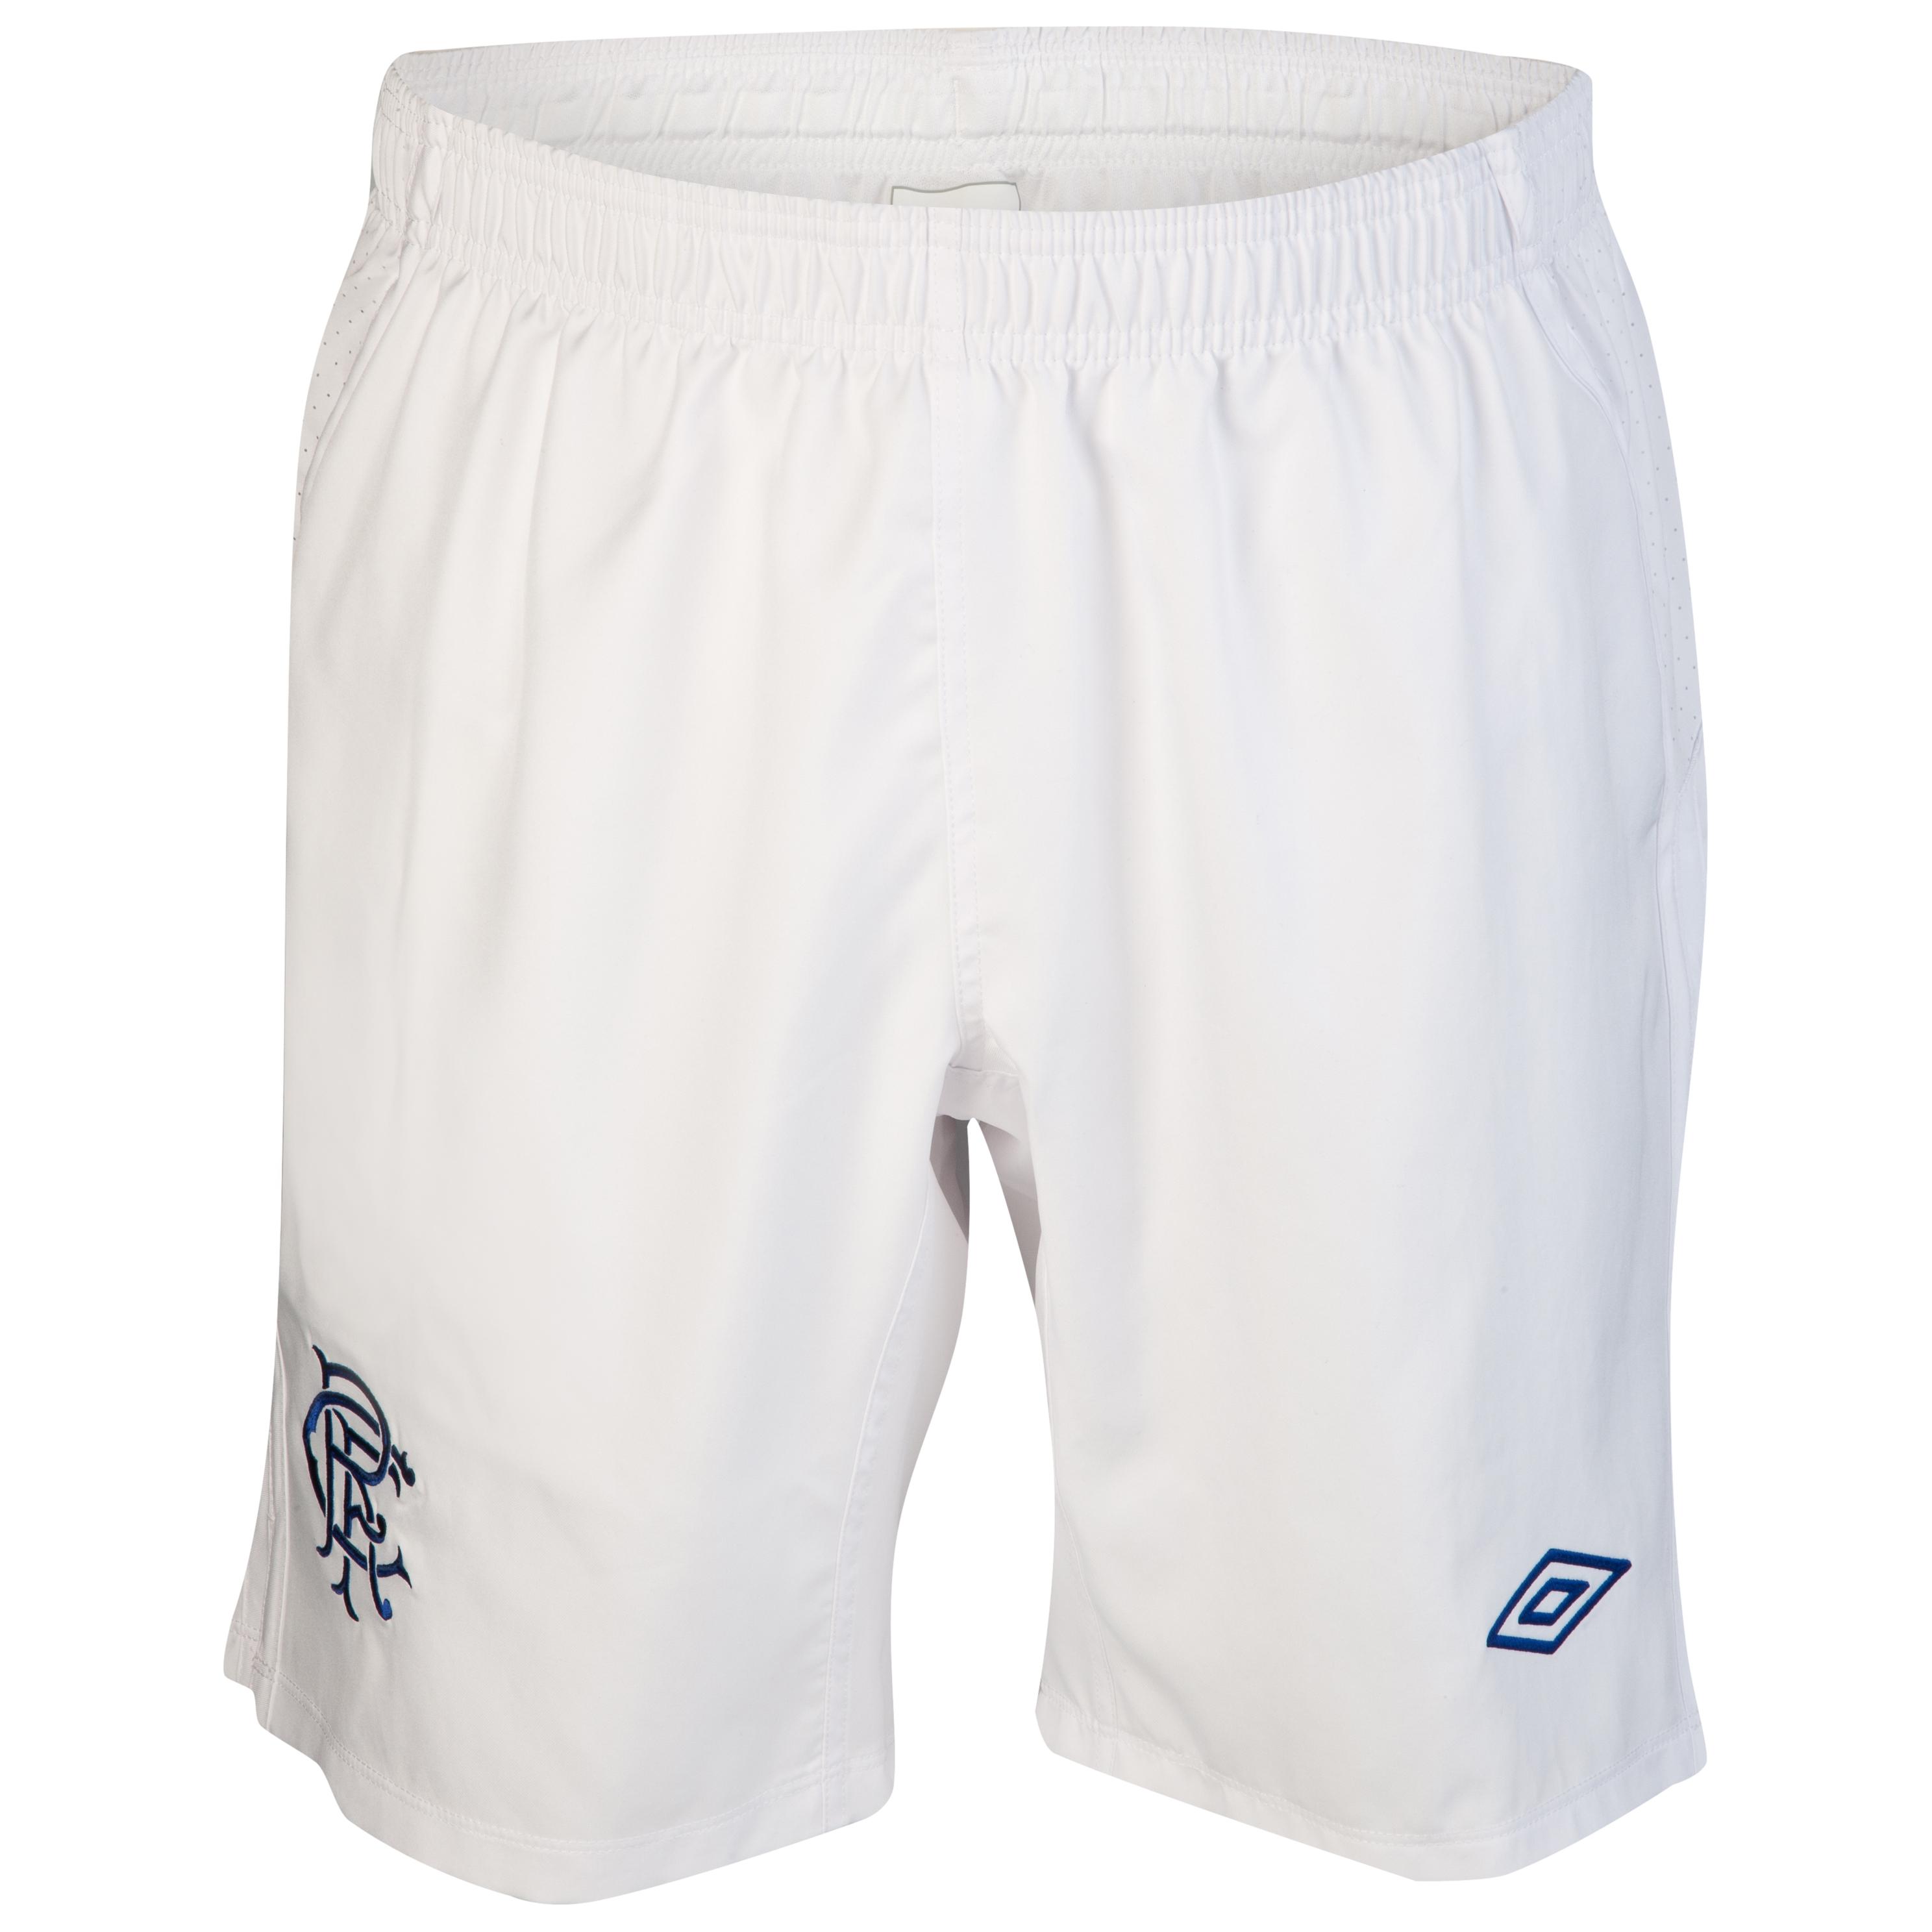 Glasgow Rangers Home Shorts 2012/13 - Kids